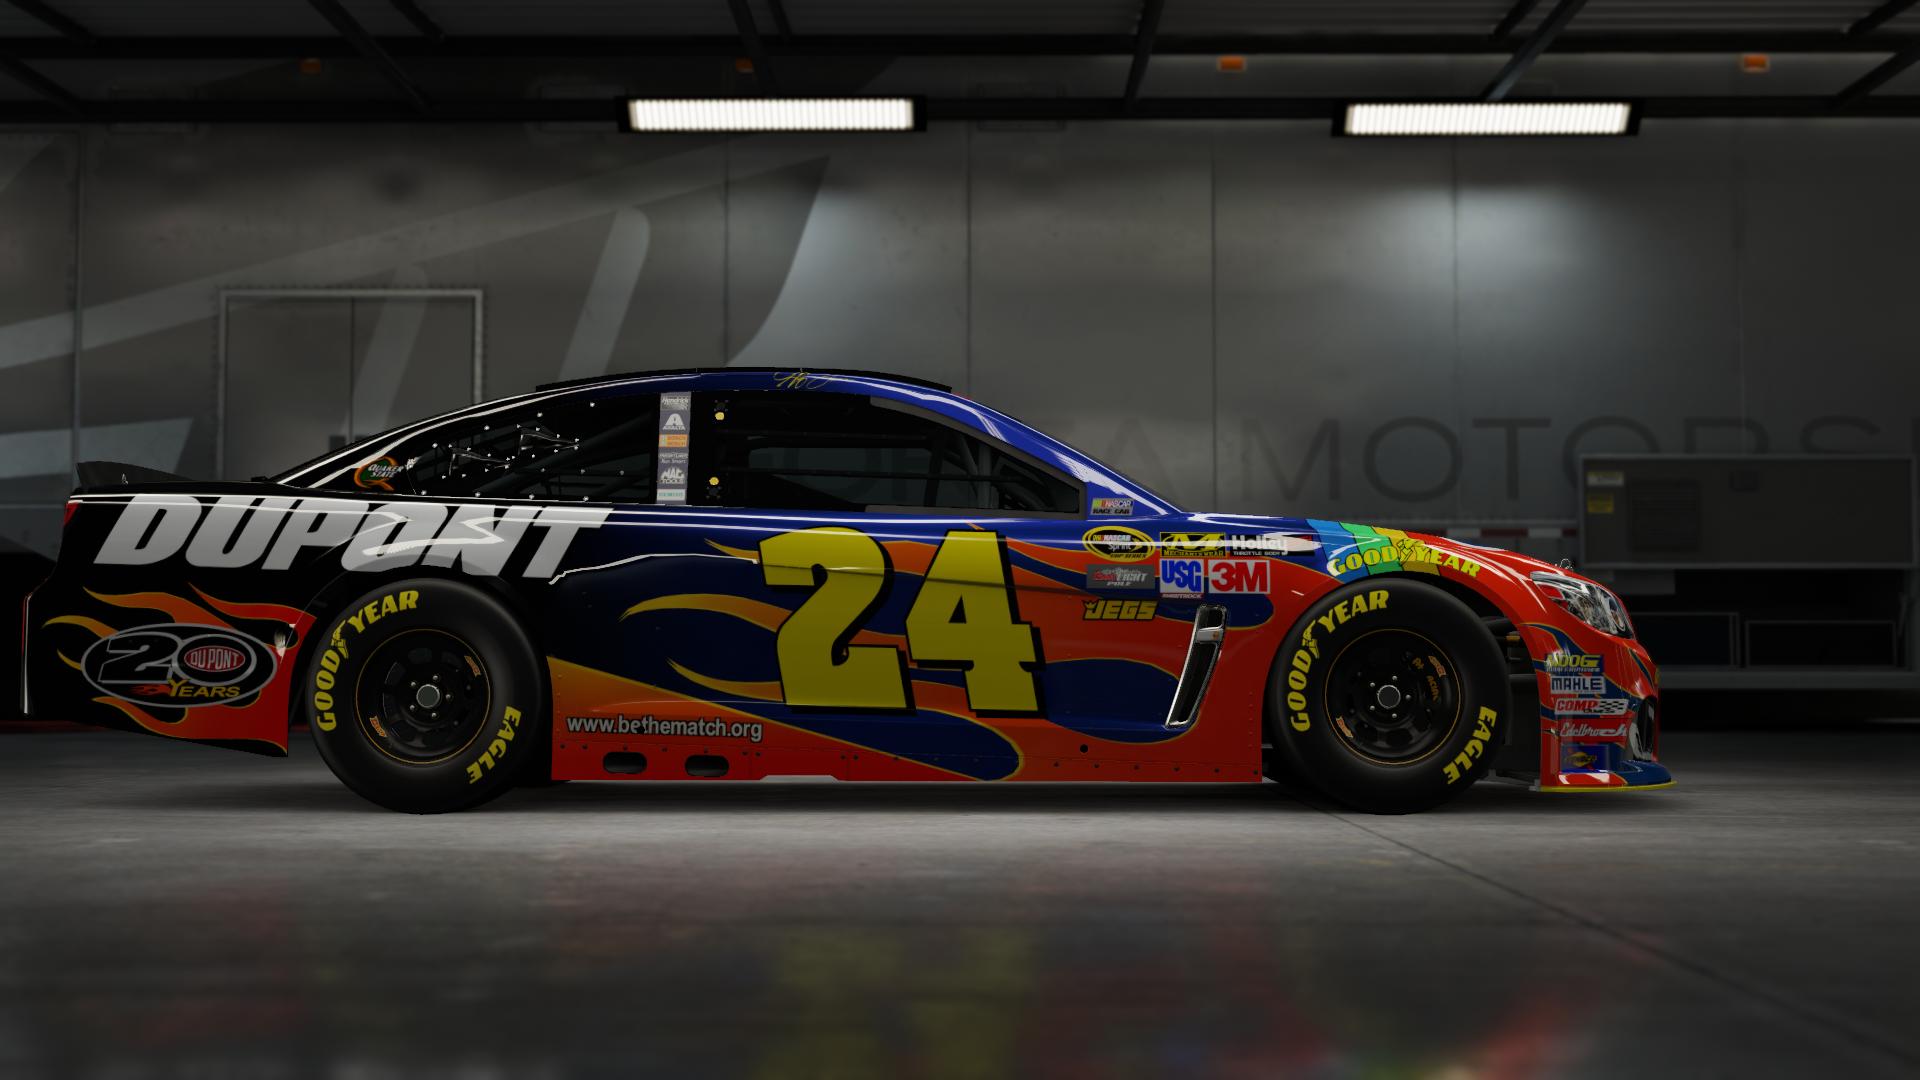 On the #24 Hendrick Motorsports NAPA Super Sport, Made by SweedishThunder